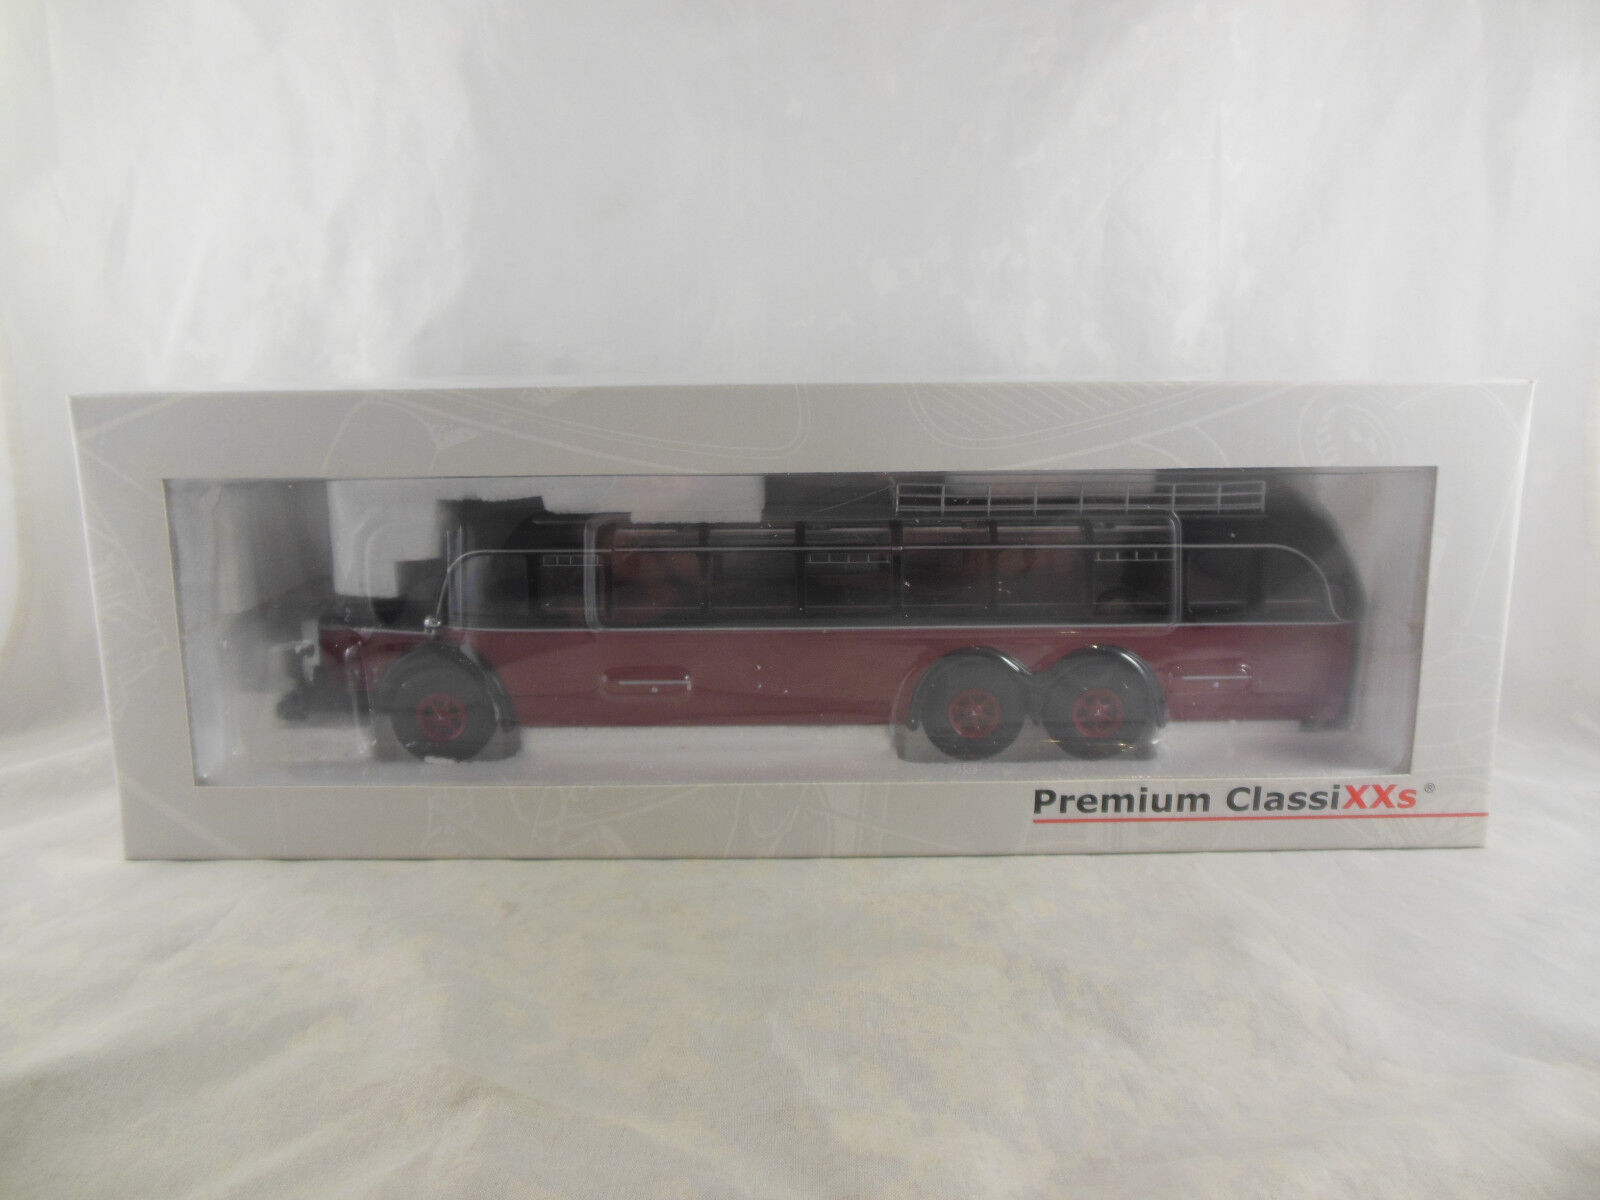 Premium Classixxs ref 12300 Mercedes Benz o 1000 entrenador Rojo y Negro 1 de 1000